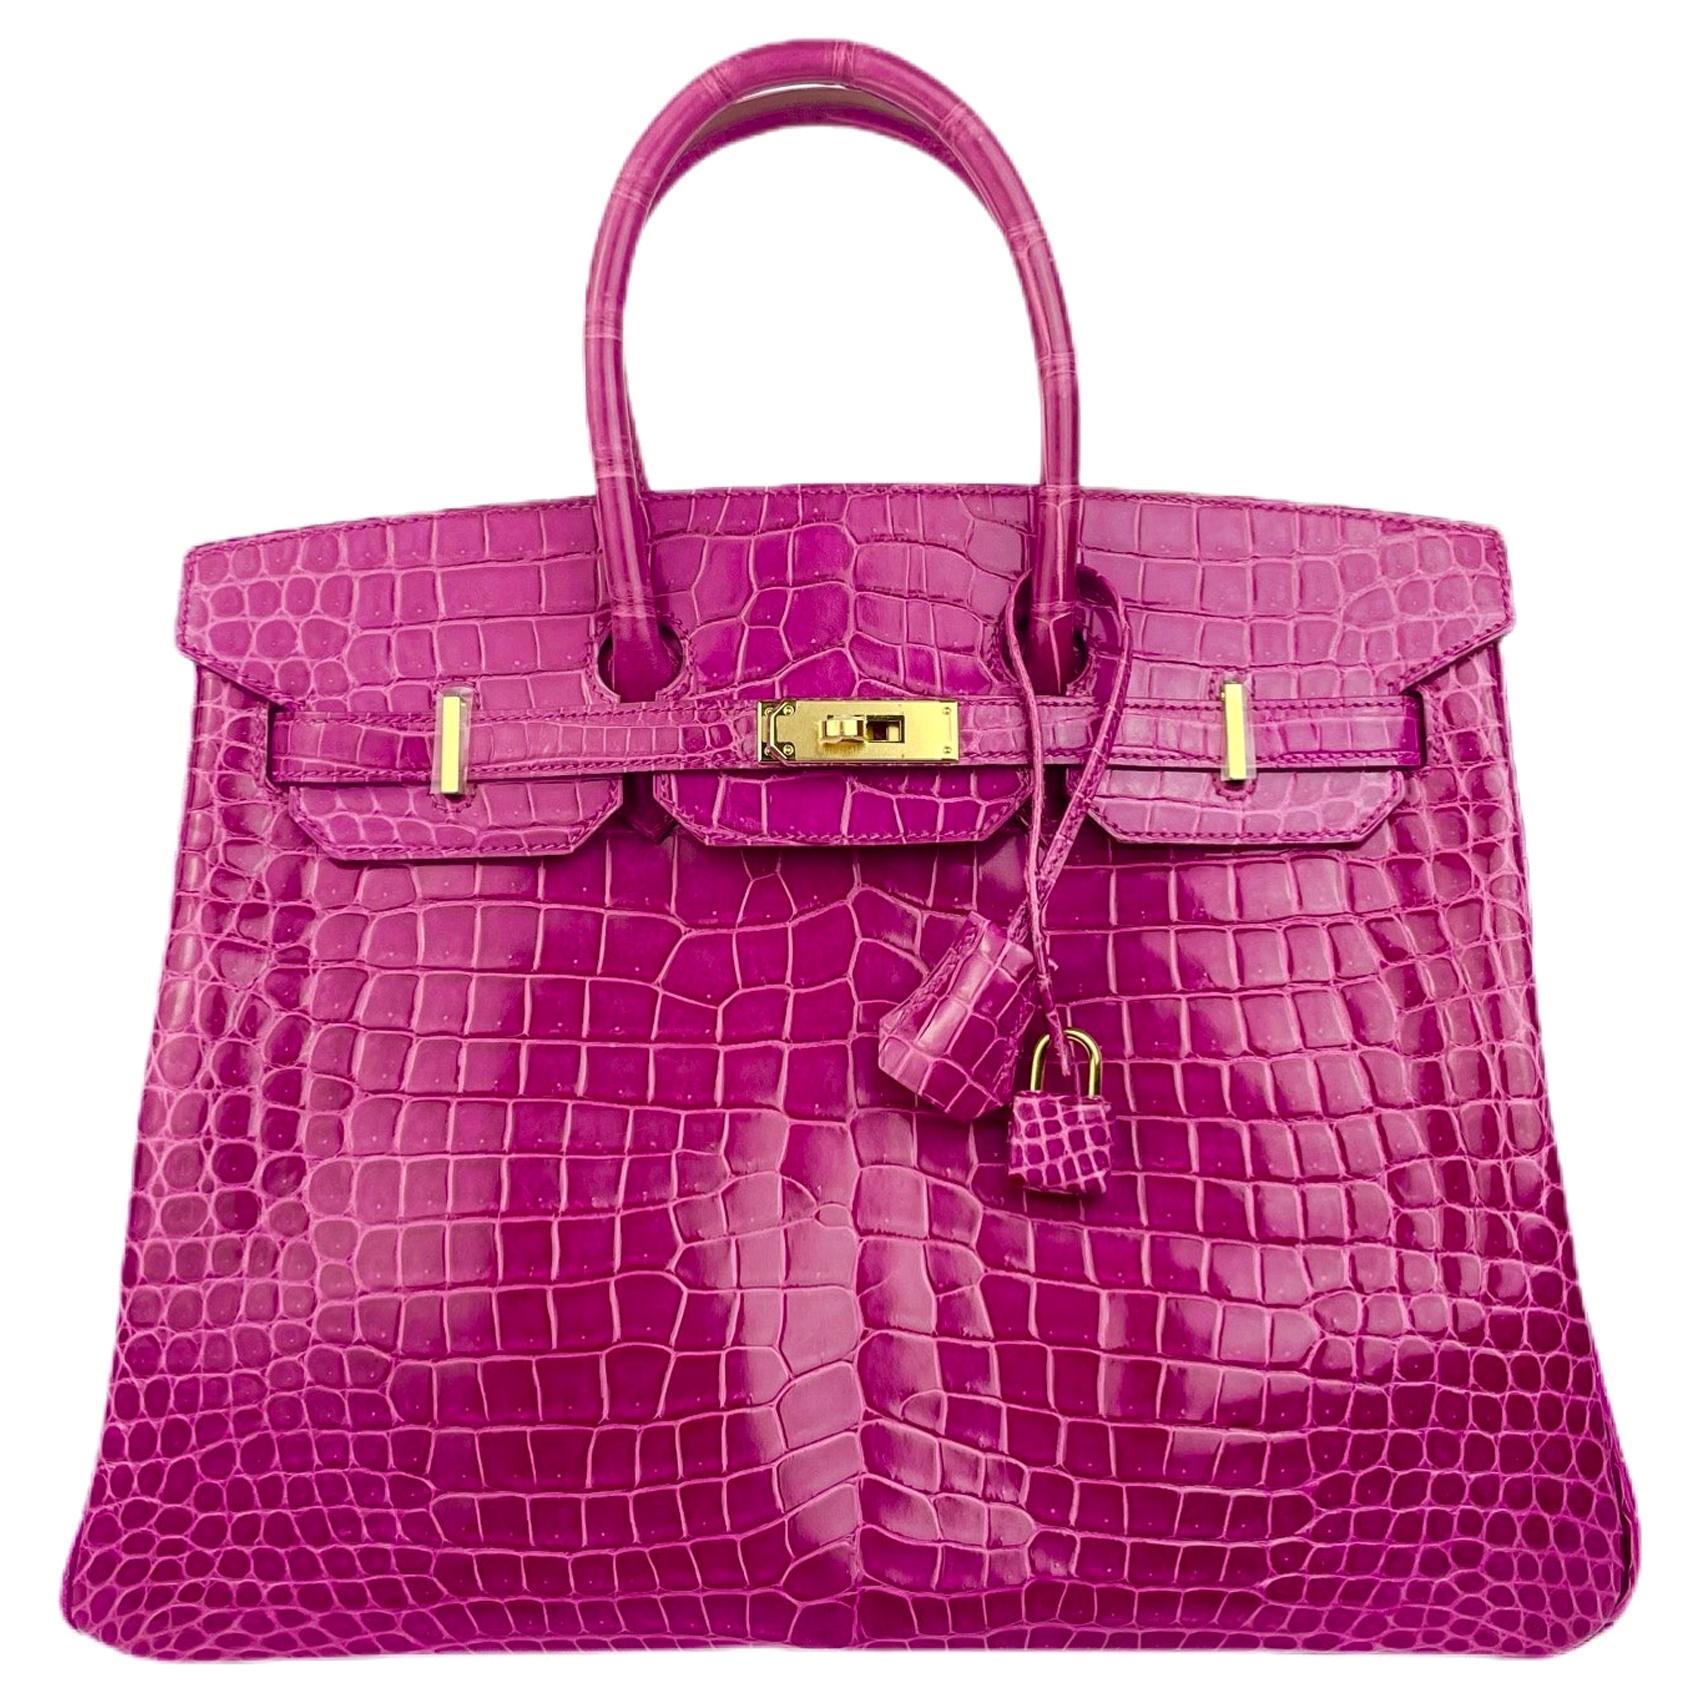 Hermes Birkin 35 Rose Scheherazade Pink Crocodile Gold Hardware